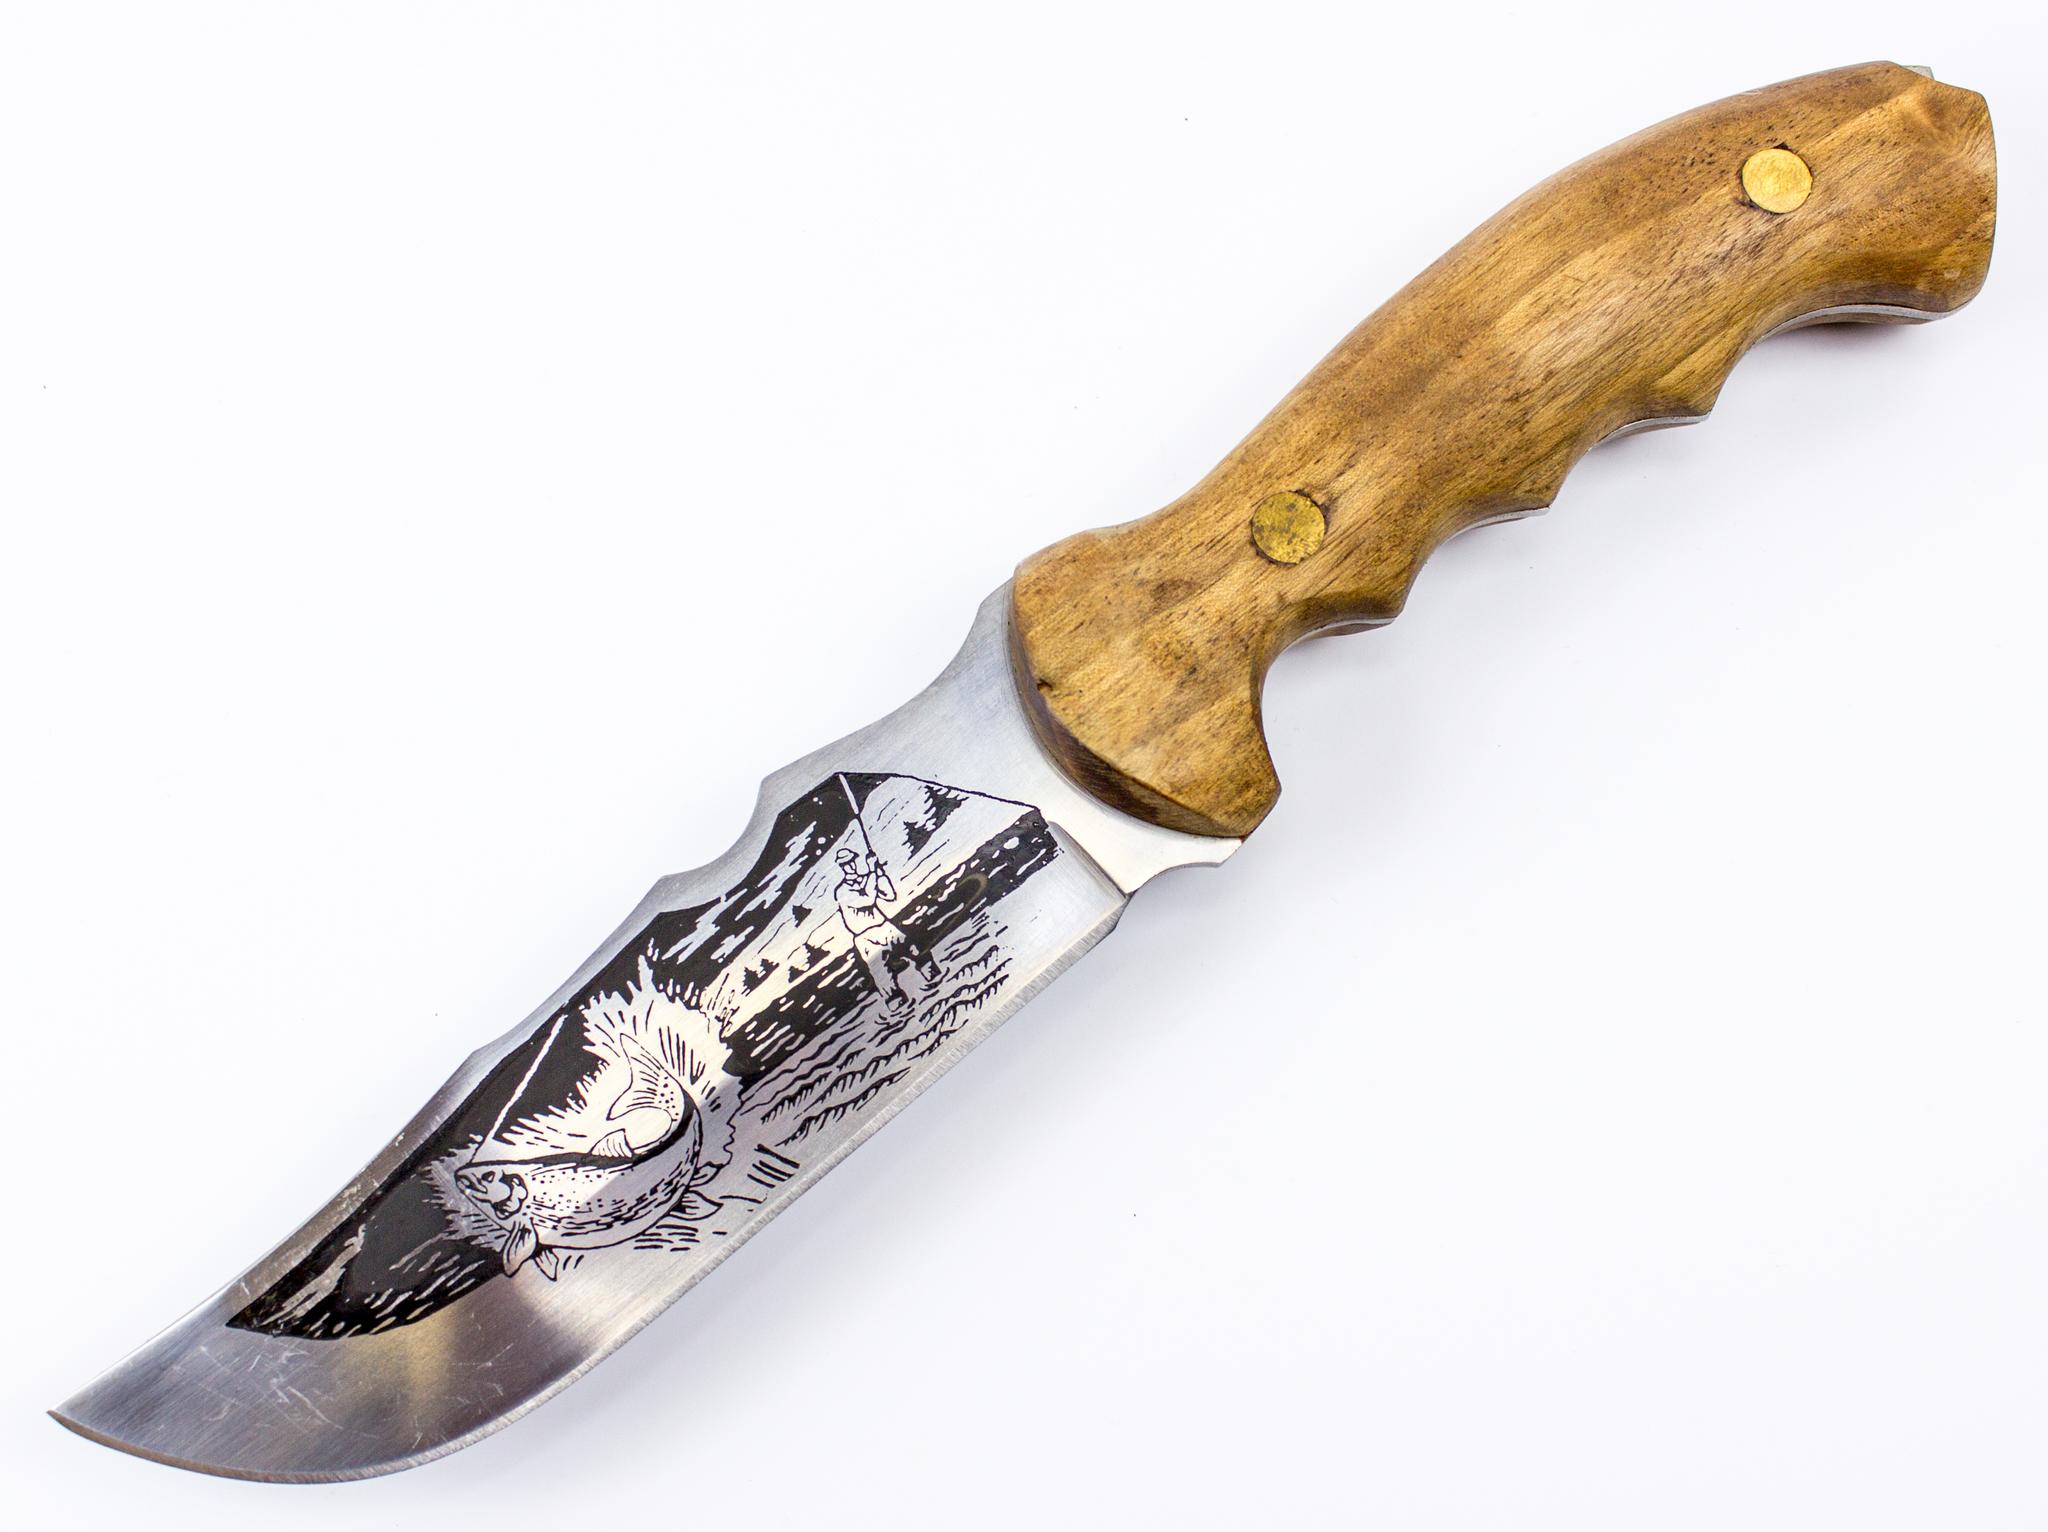 Нож Каспий, Кизляр нож крот черный кизляр